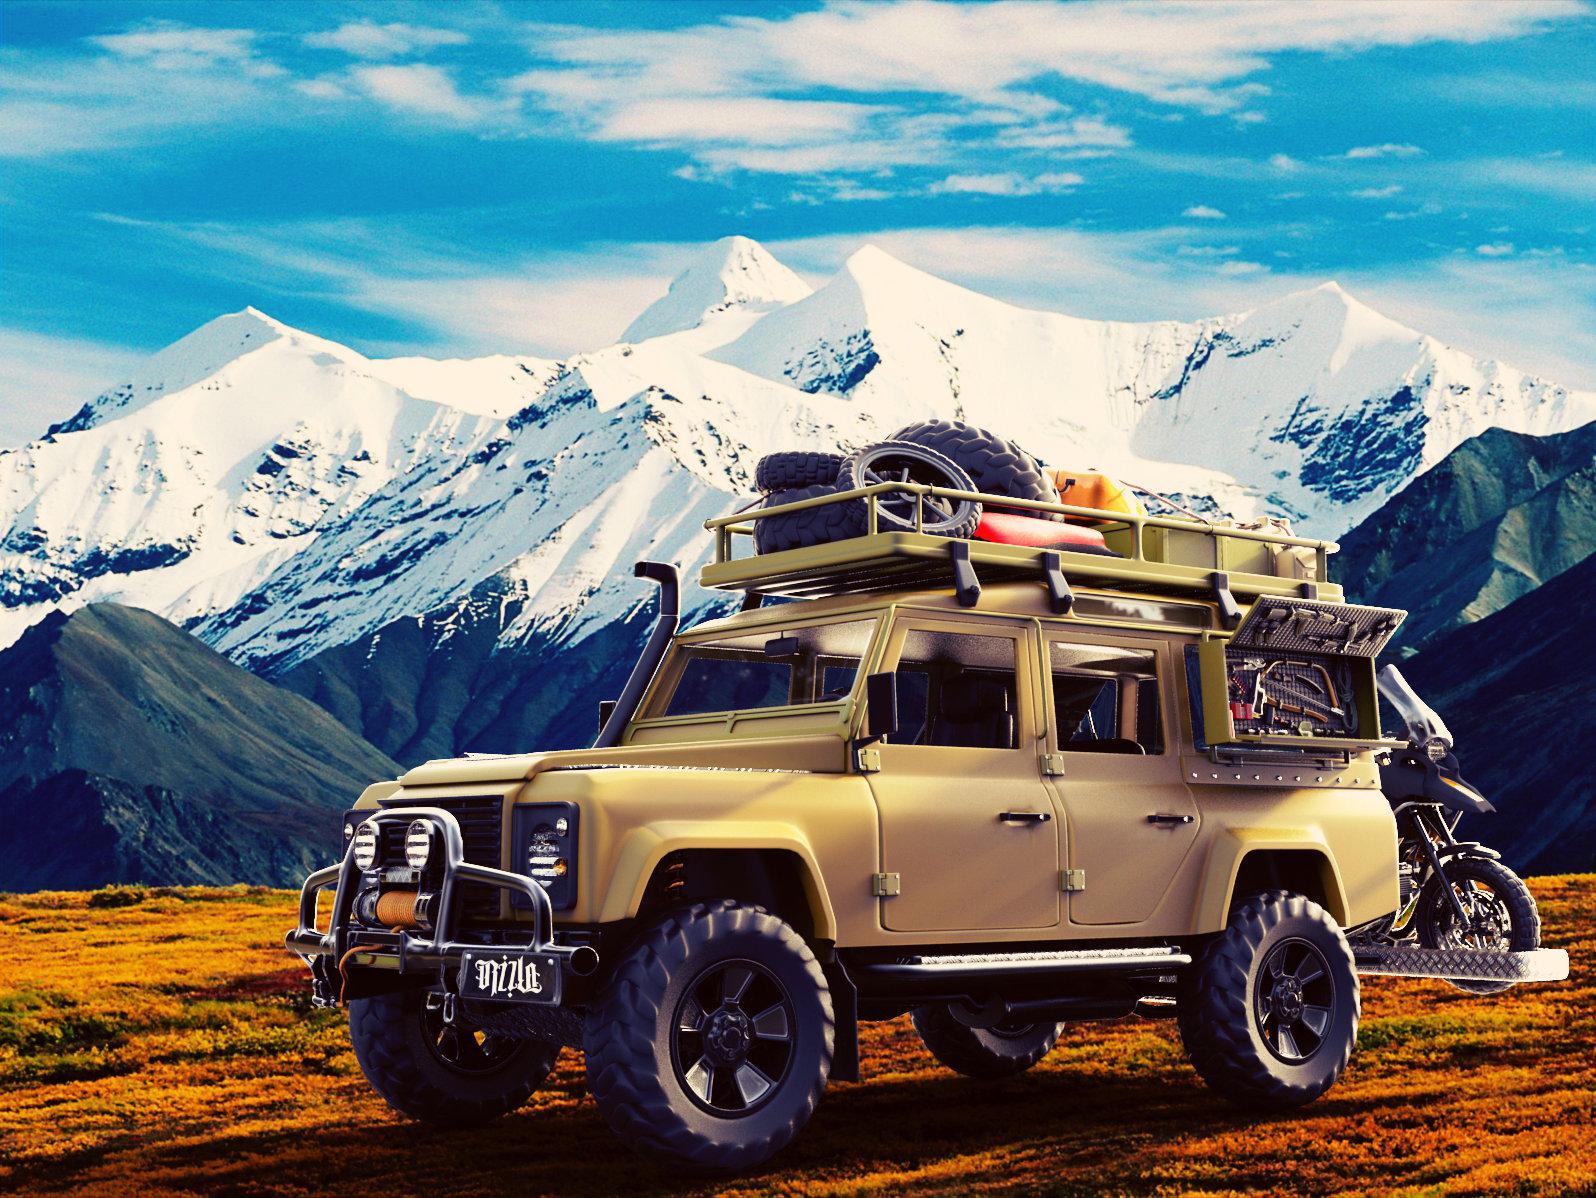 Marko Petric Land Rover Defender 130 Quot Adventure Quot